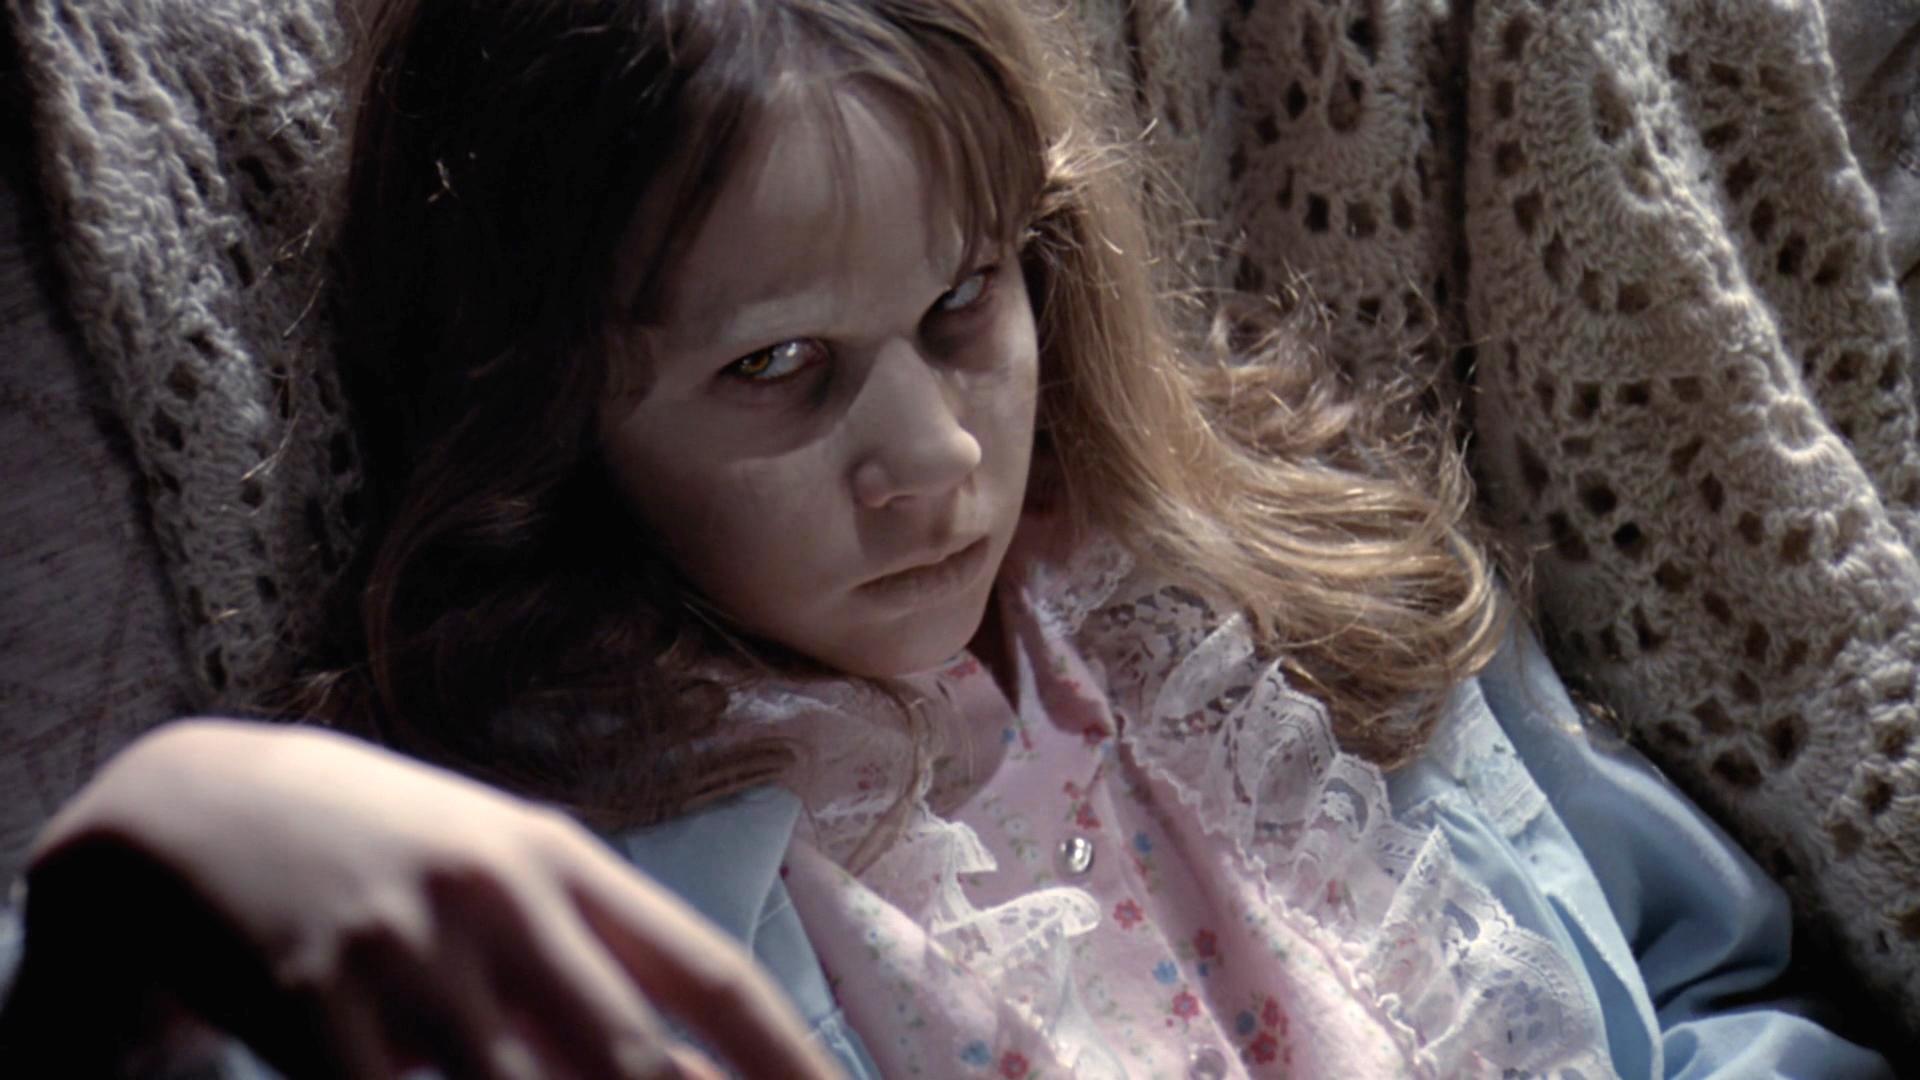 exorcist12HERO MAGAZINE WEEKEND COMBO HALLOWEEN EXCORSIST MUSIC EAT LONDON DEATH JAKE GYLENHALL DONNIE DARKO ART HOGARTH